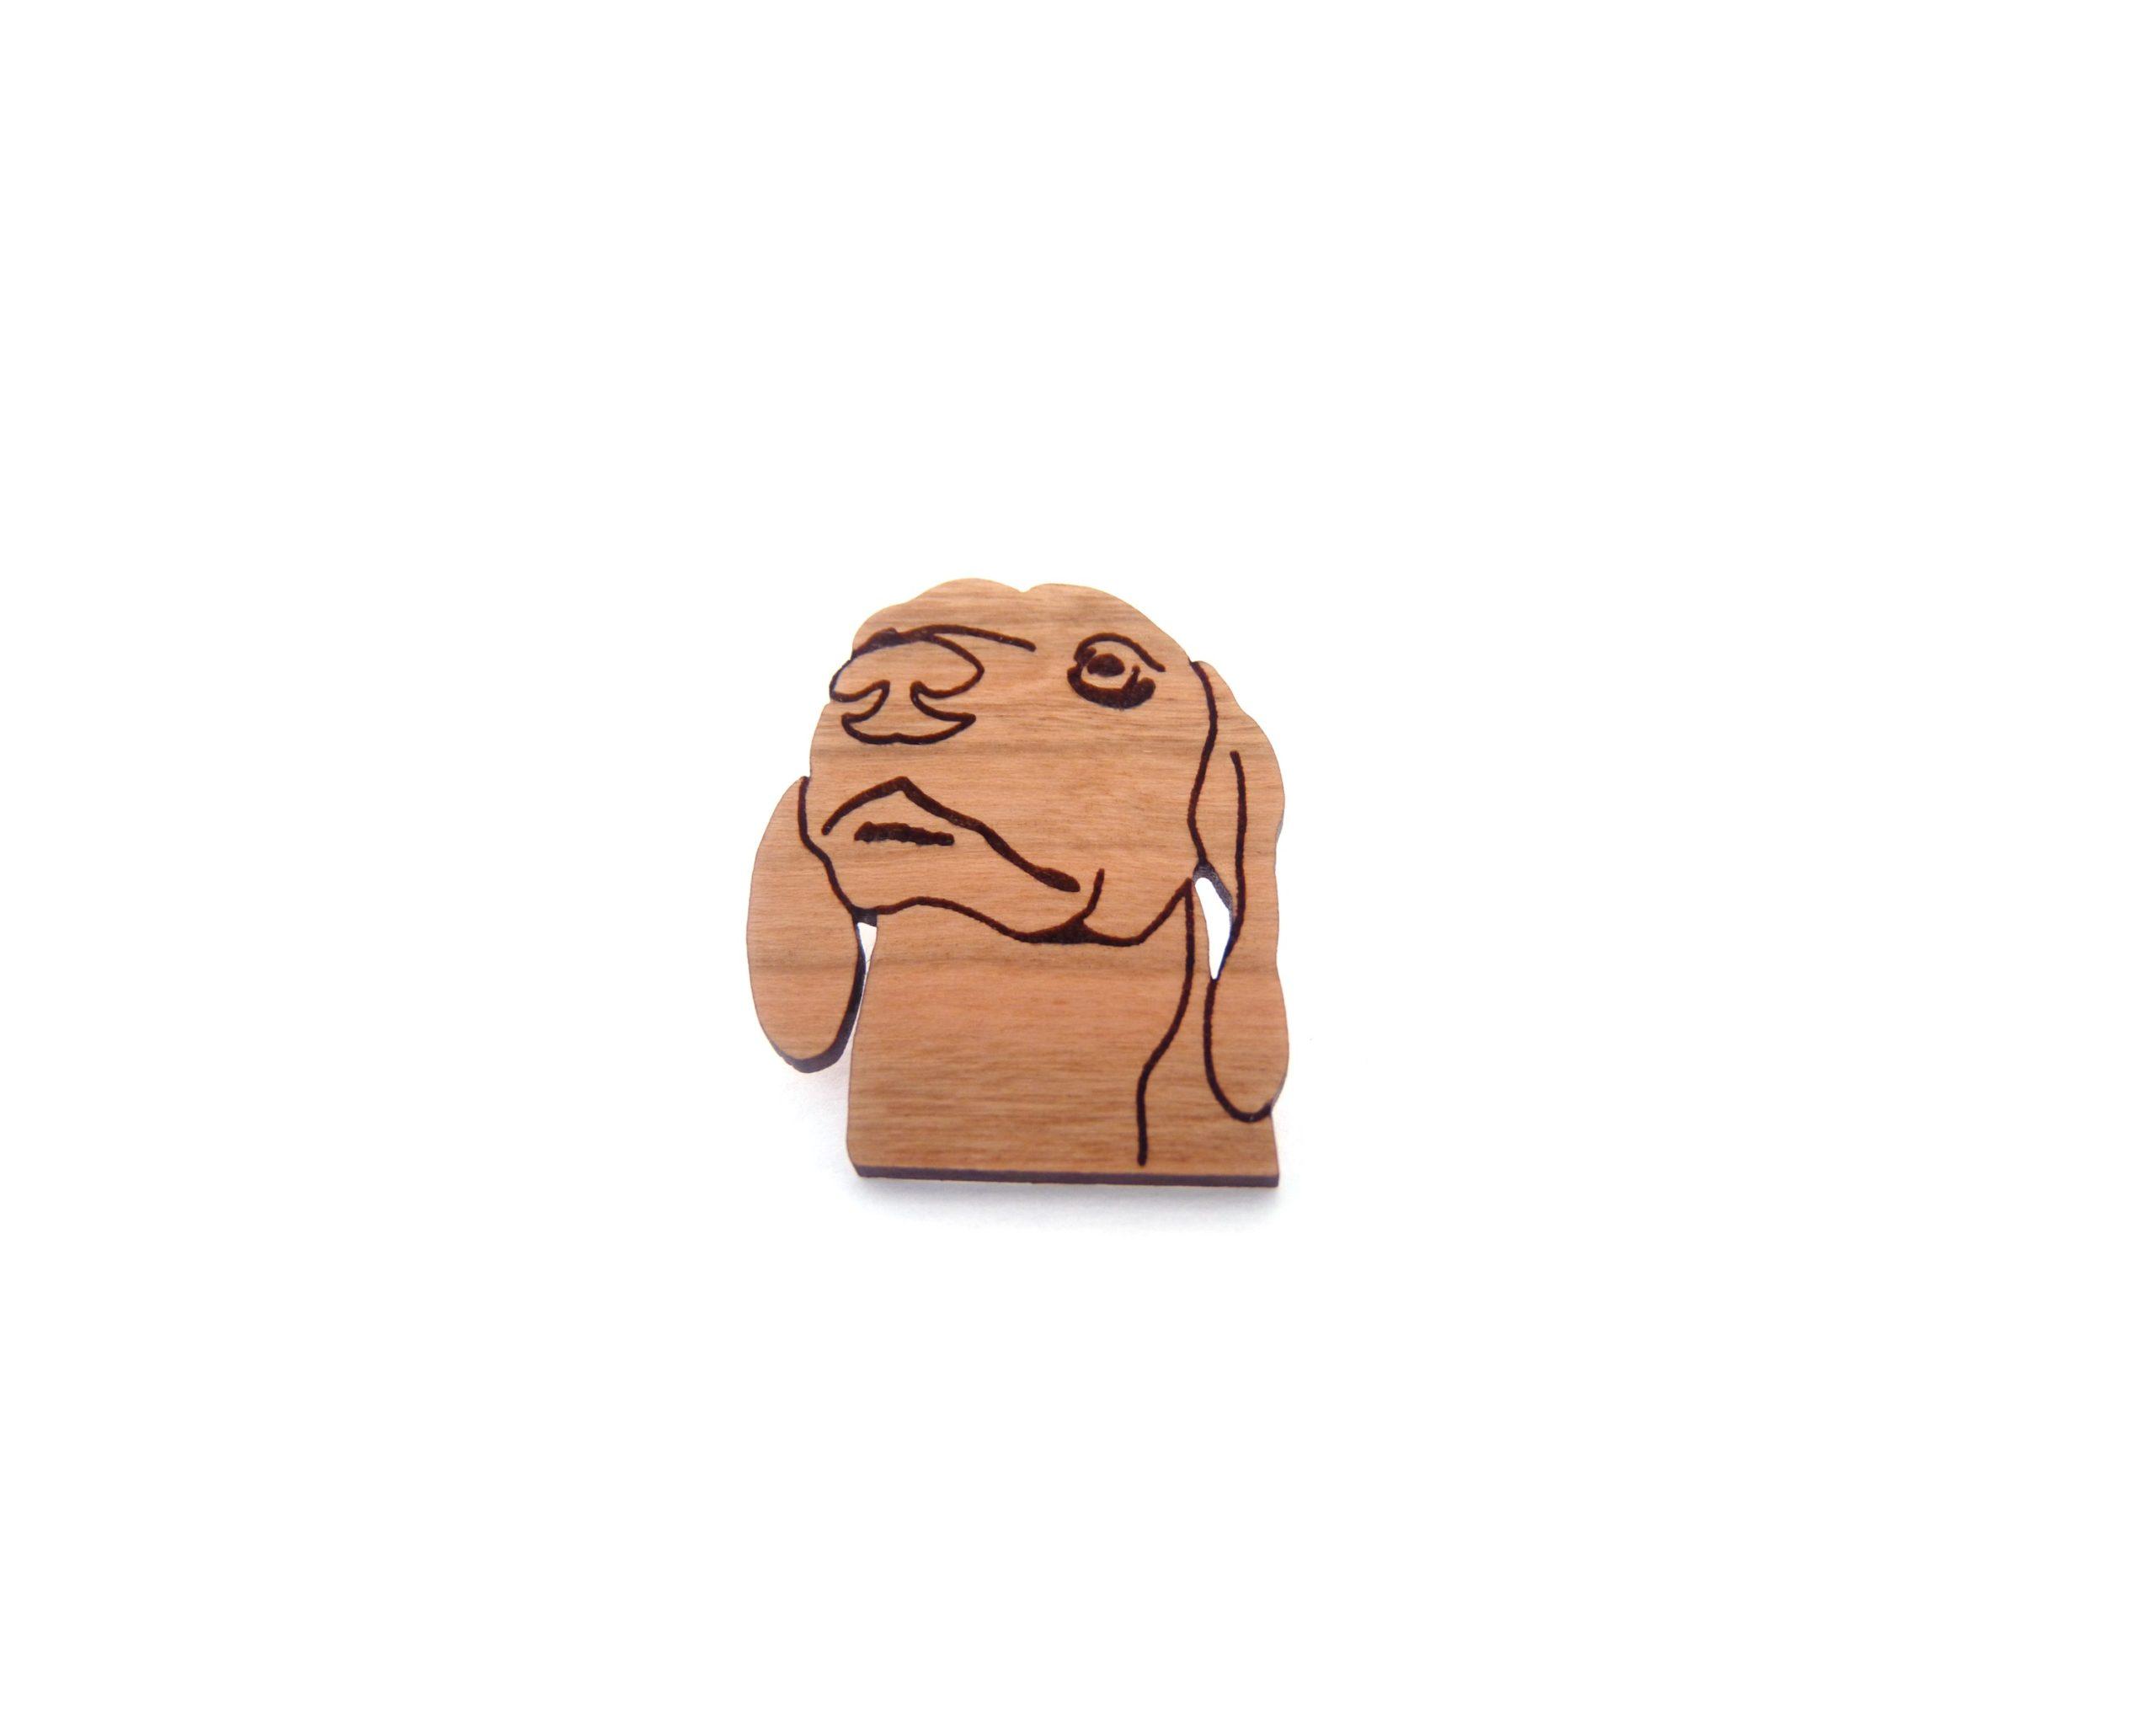 Dachshund Dog Maple Hardwood Pin | Hand Drawn